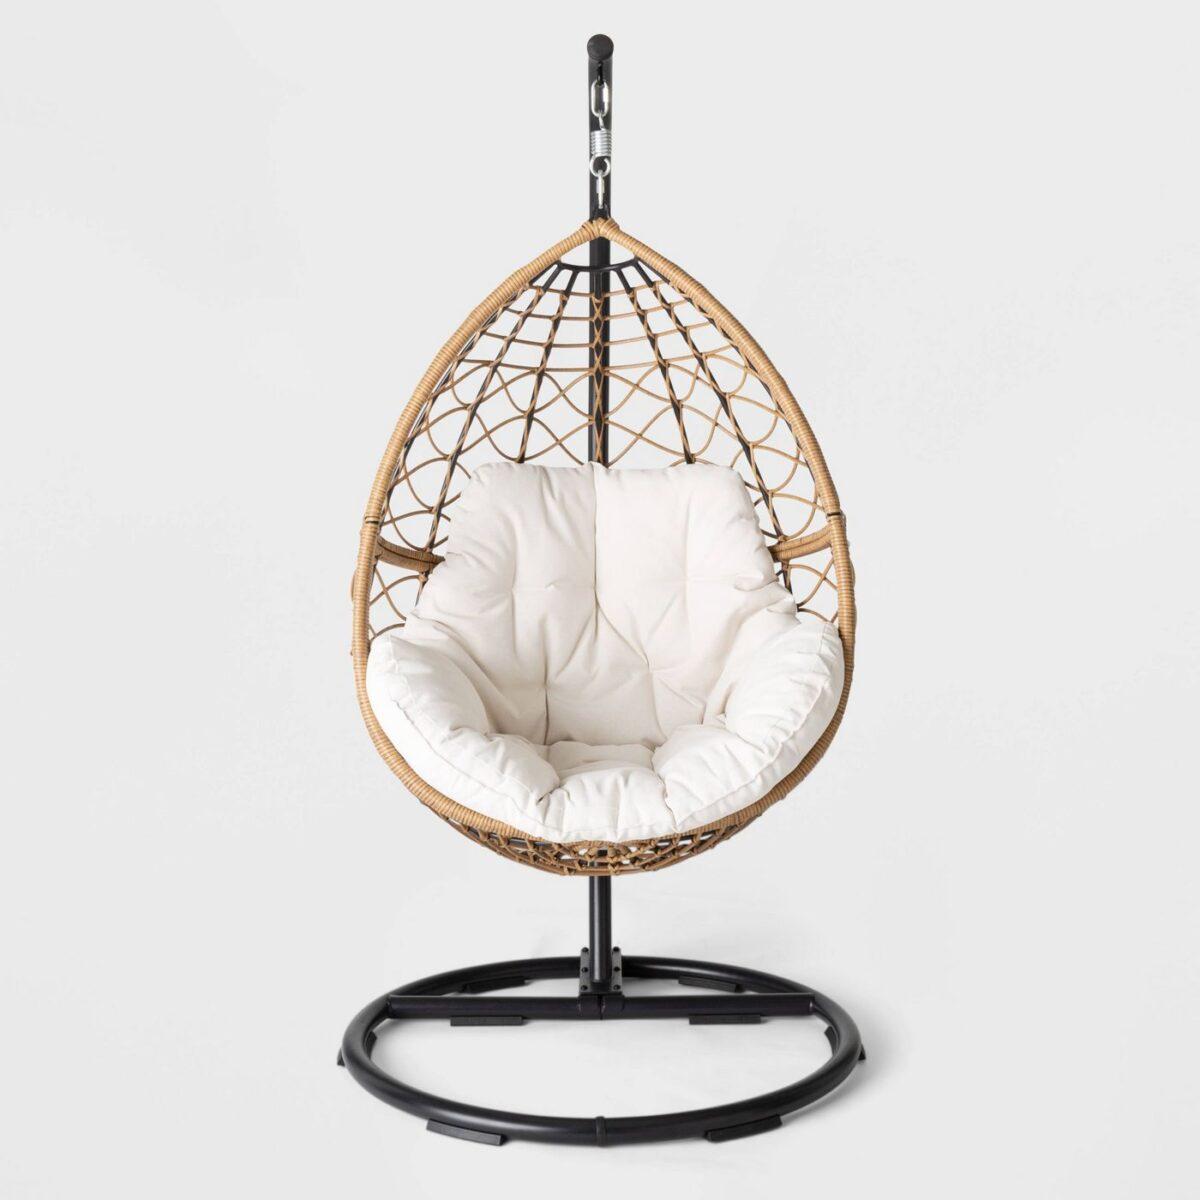 Britanna Patio Hanging Egg Chair - Natural - Opalhouse™